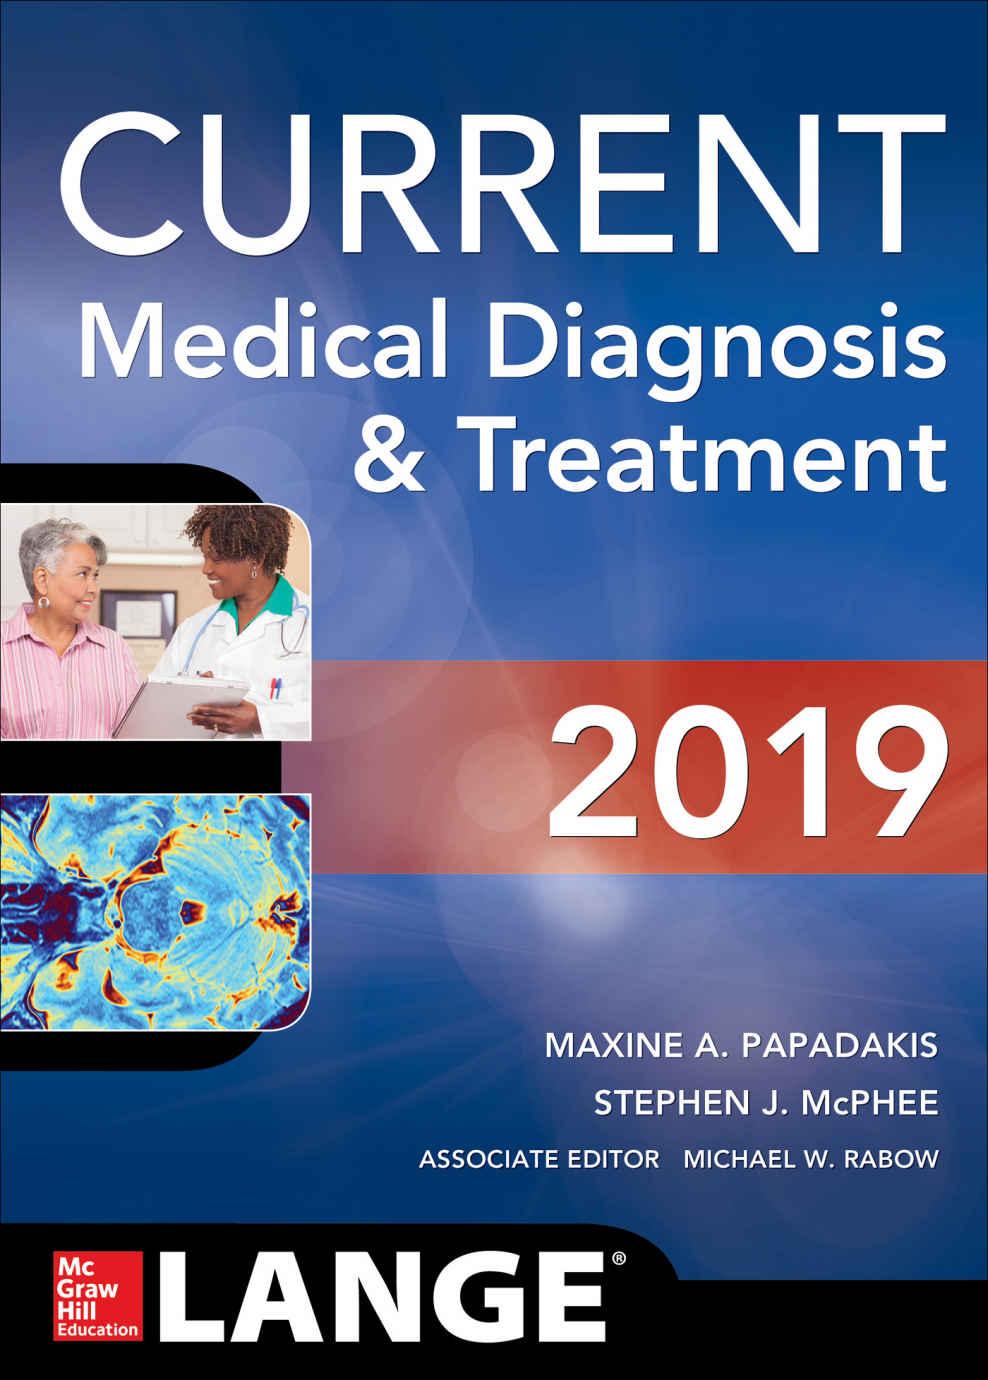 CURRENT Medical Diagnosis & Treatment 2019 – Maxine A. Papadakis